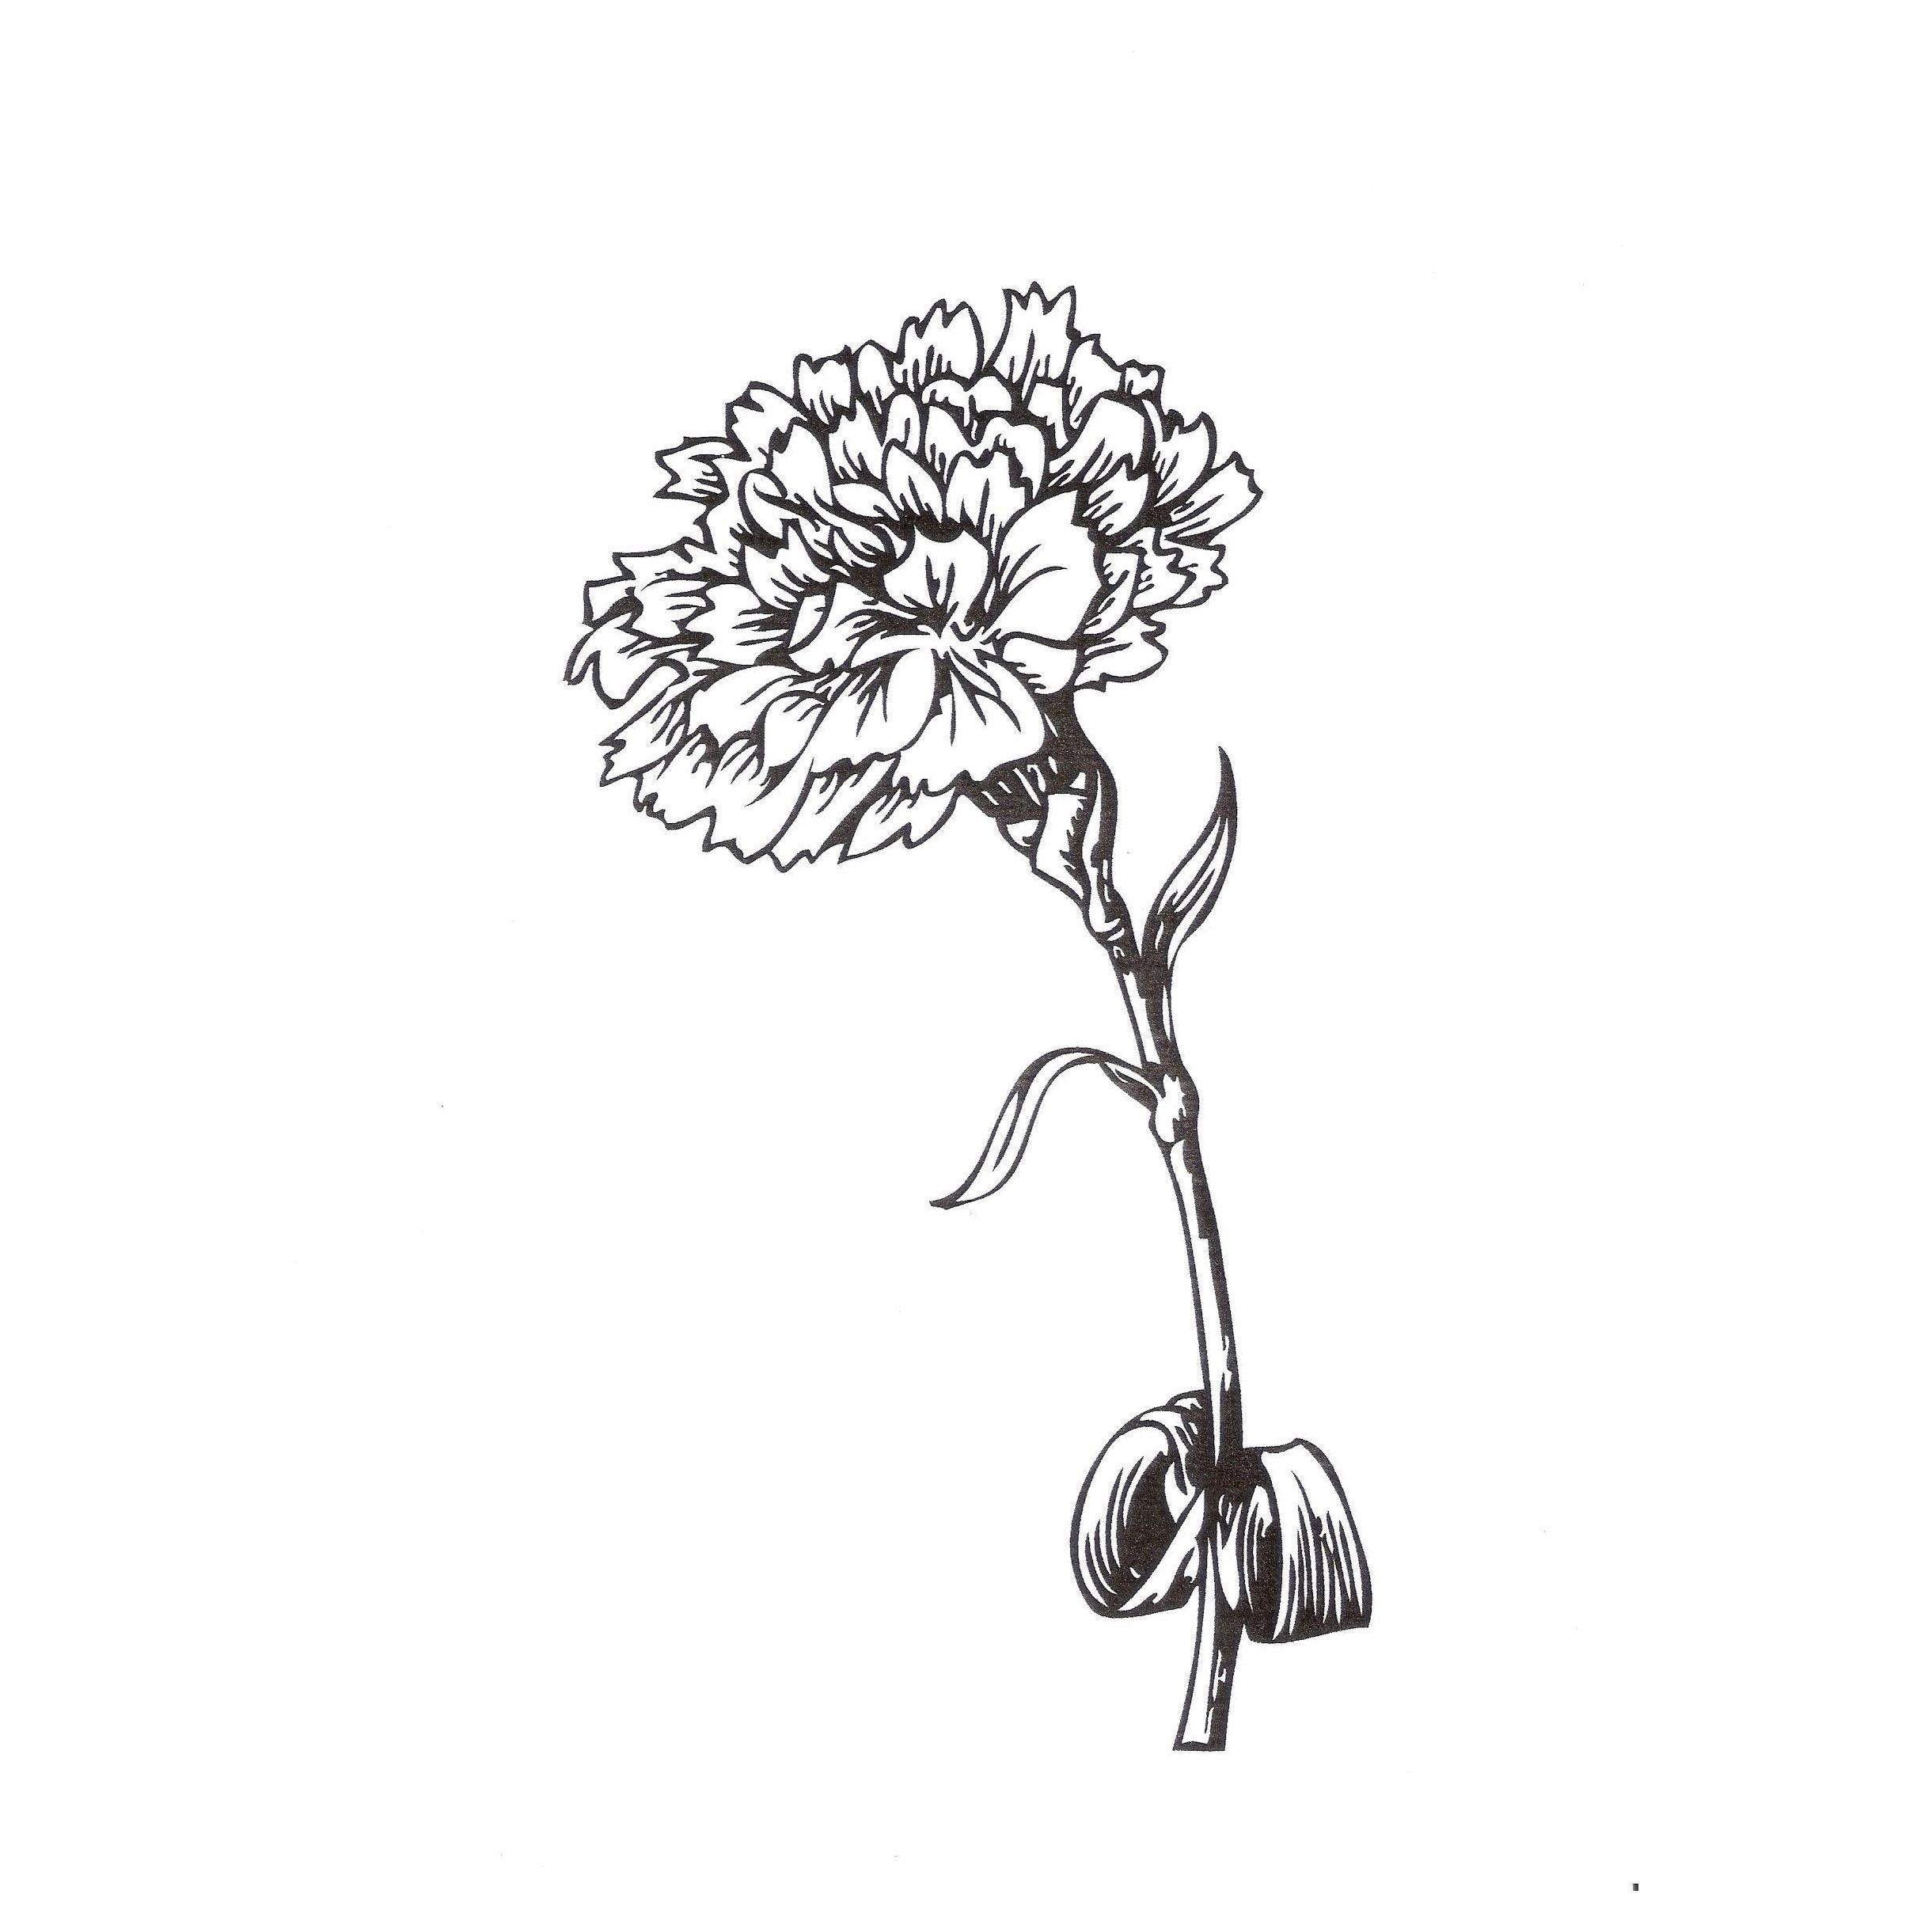 dibujos de clavel para colorear | Tatuajes | Pinterest | Clavel ...